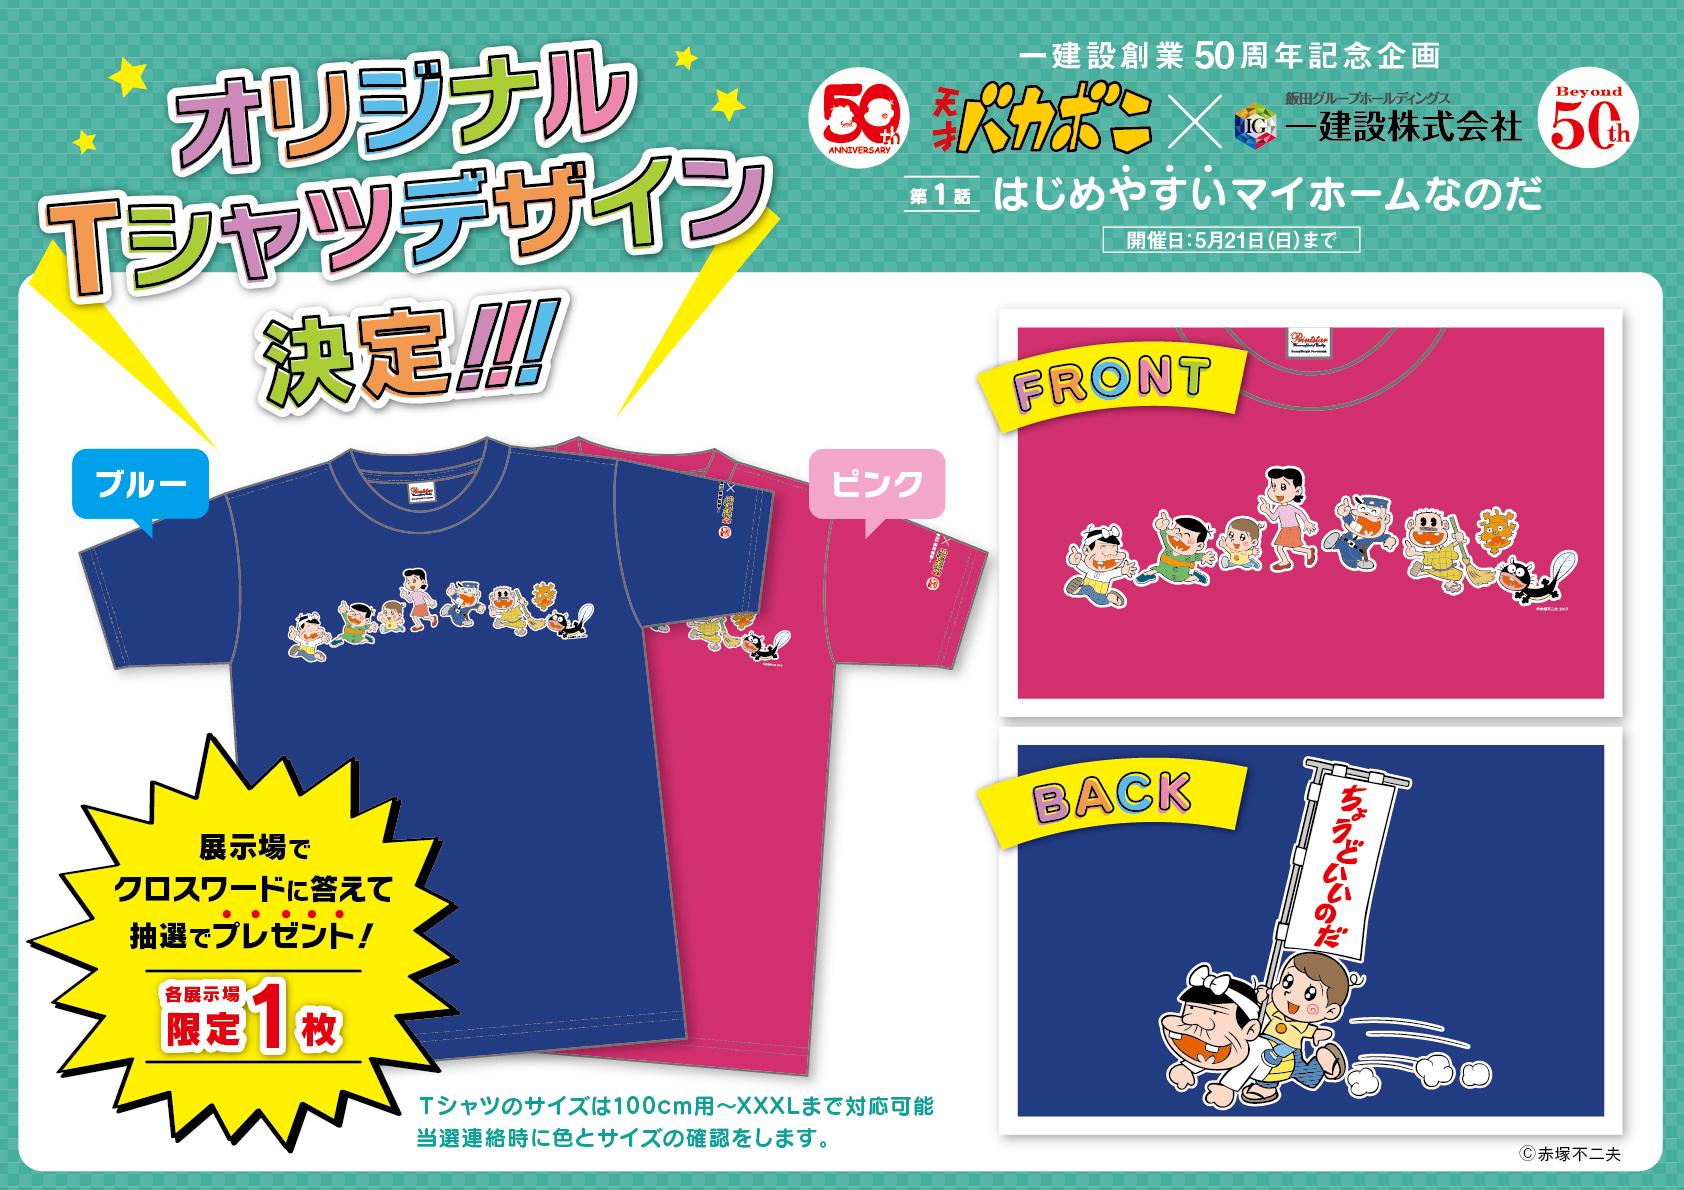 Tシャツデザイン決定